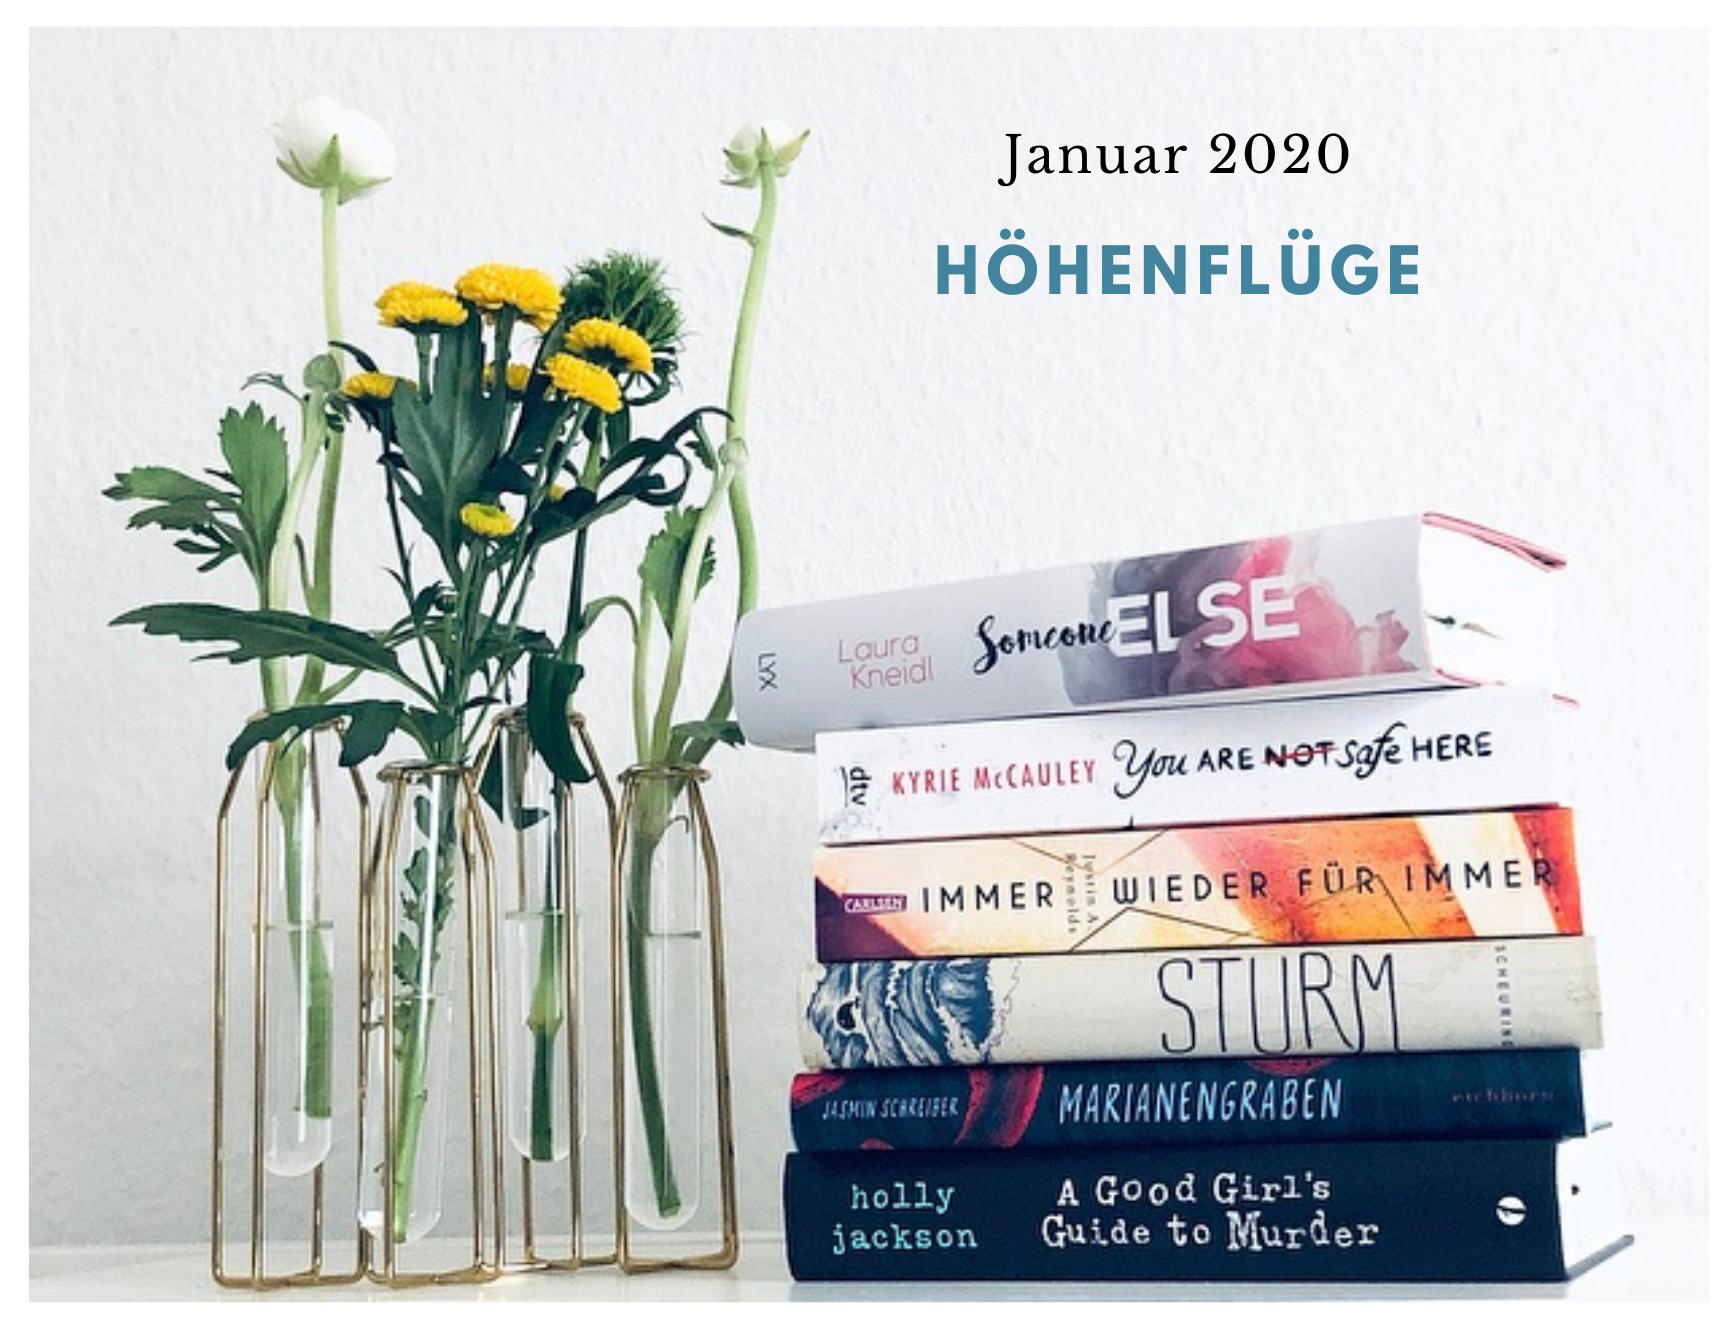 Höhenflüge - Jan. 2020